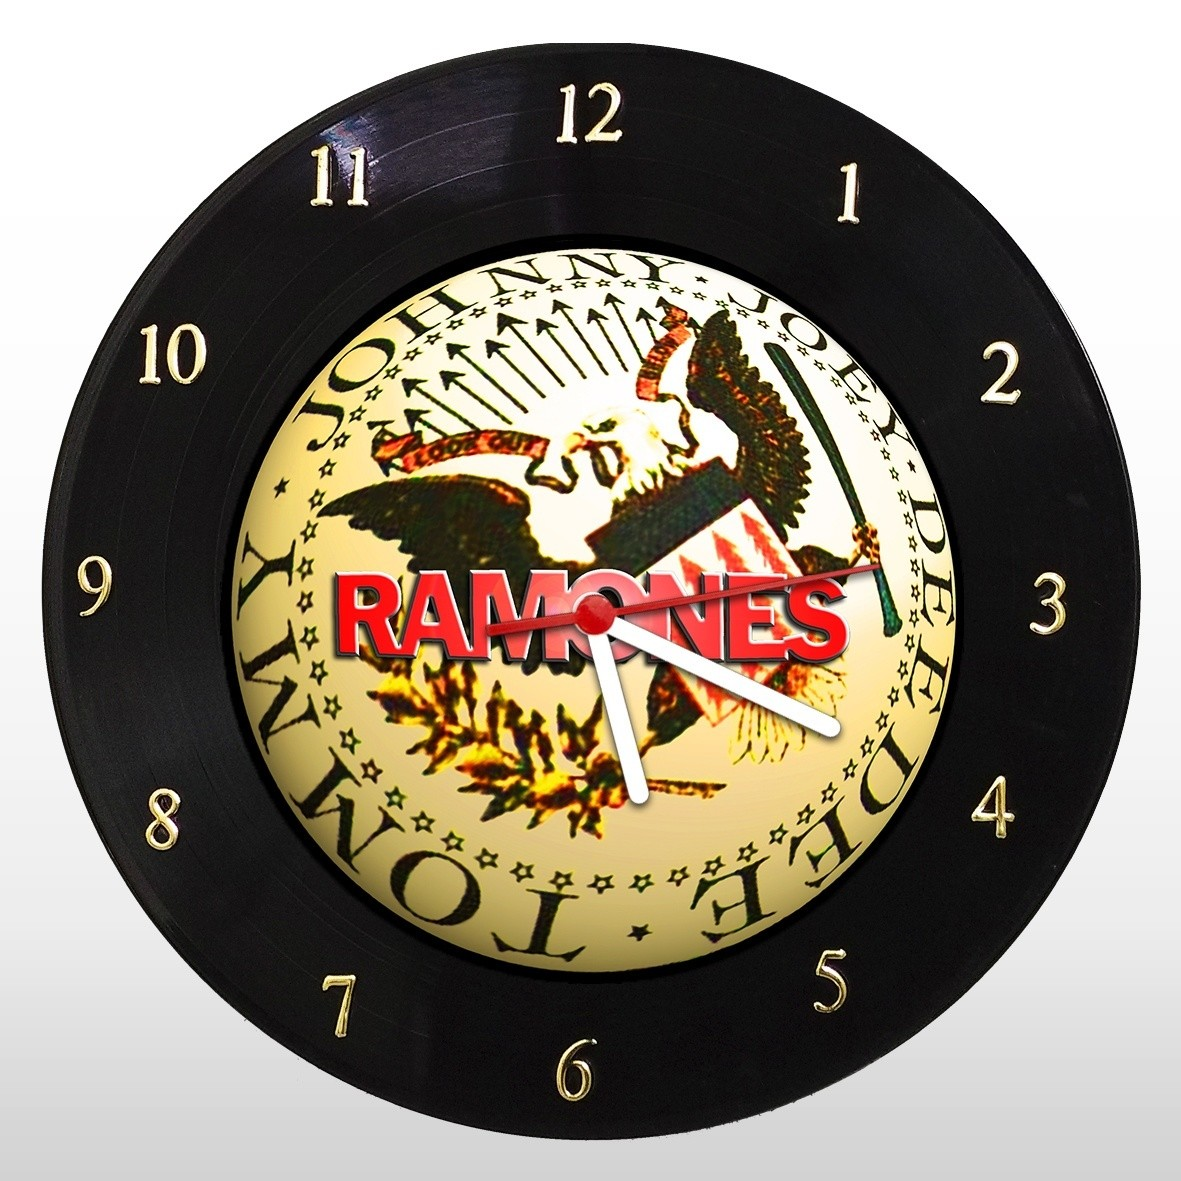 Ramones - Relógio de Parede em Disco de Vinil - Mr. Rock